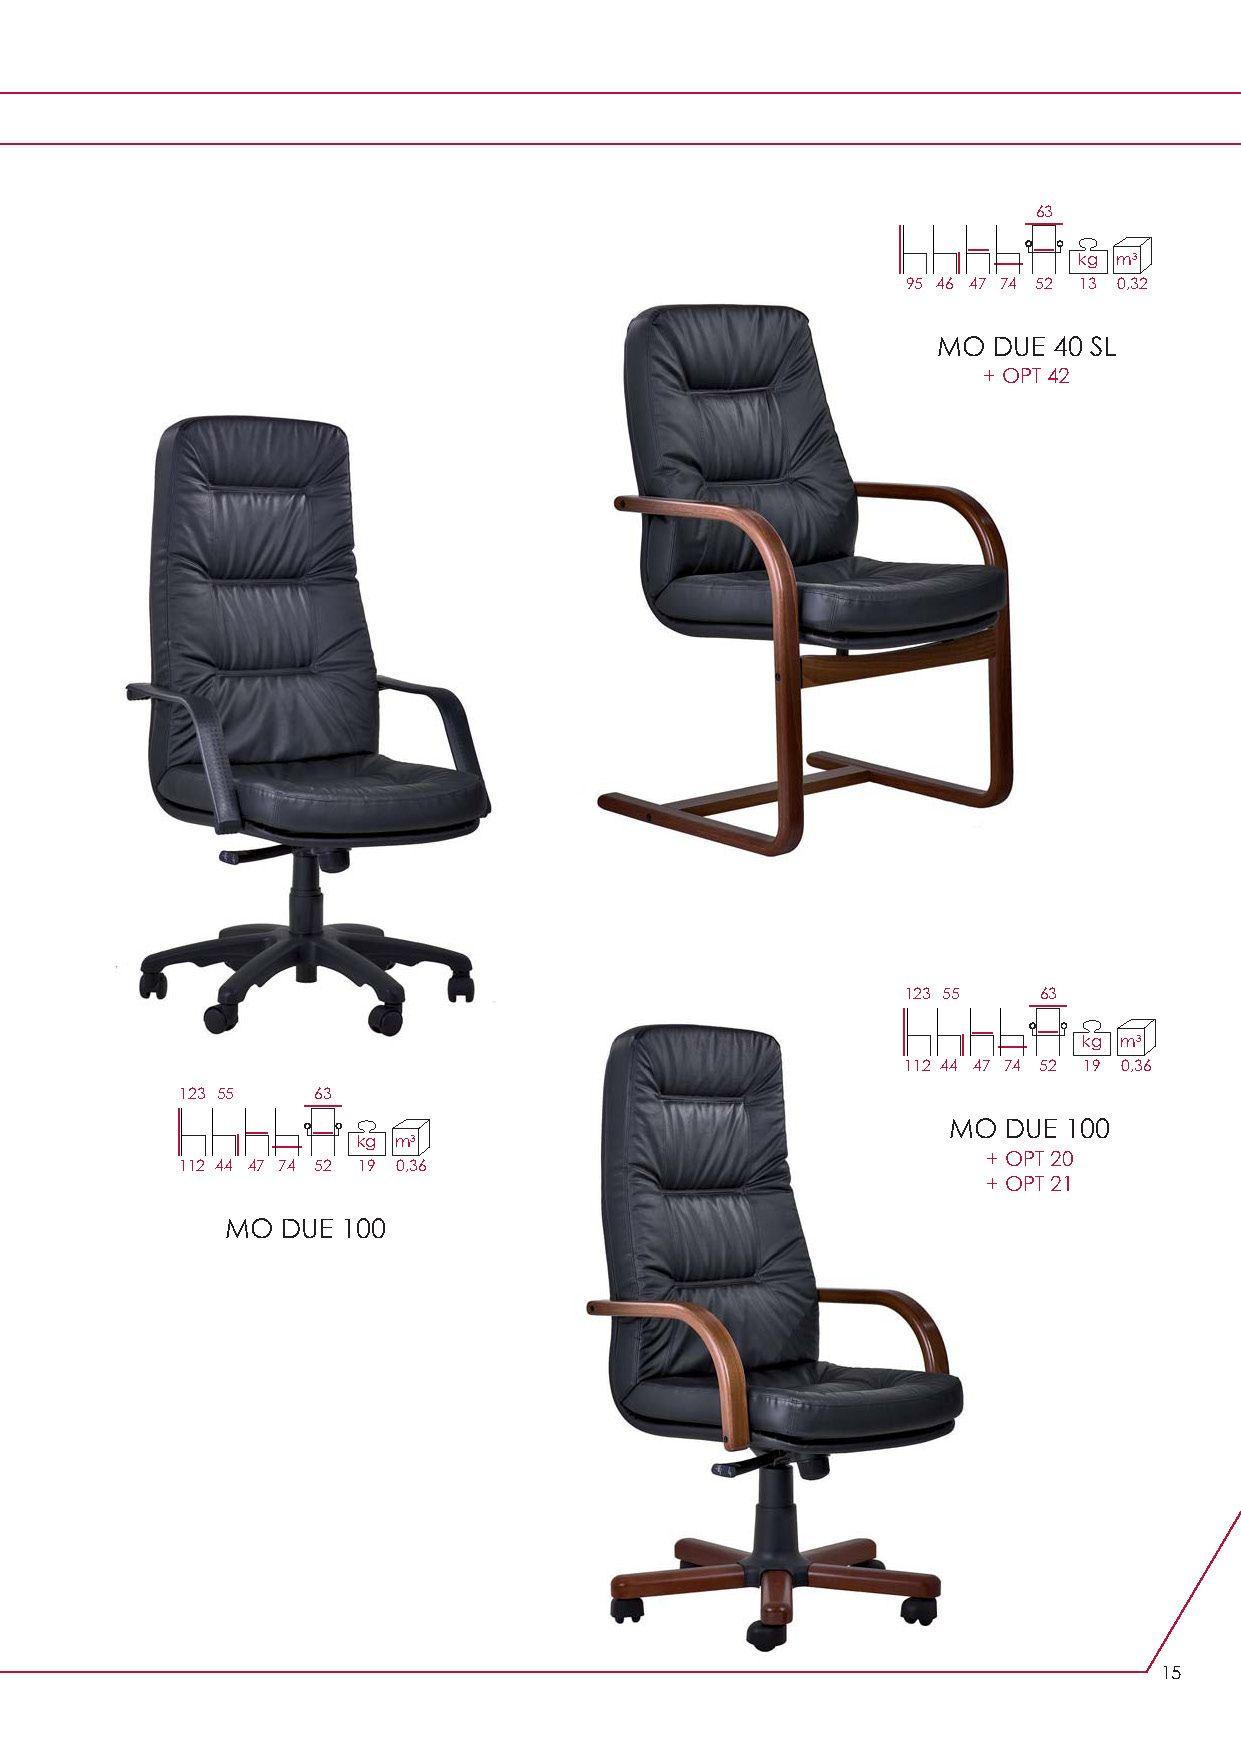 Bürostühle - Büro Stuhl Serie BookDie Möbel aus Italien